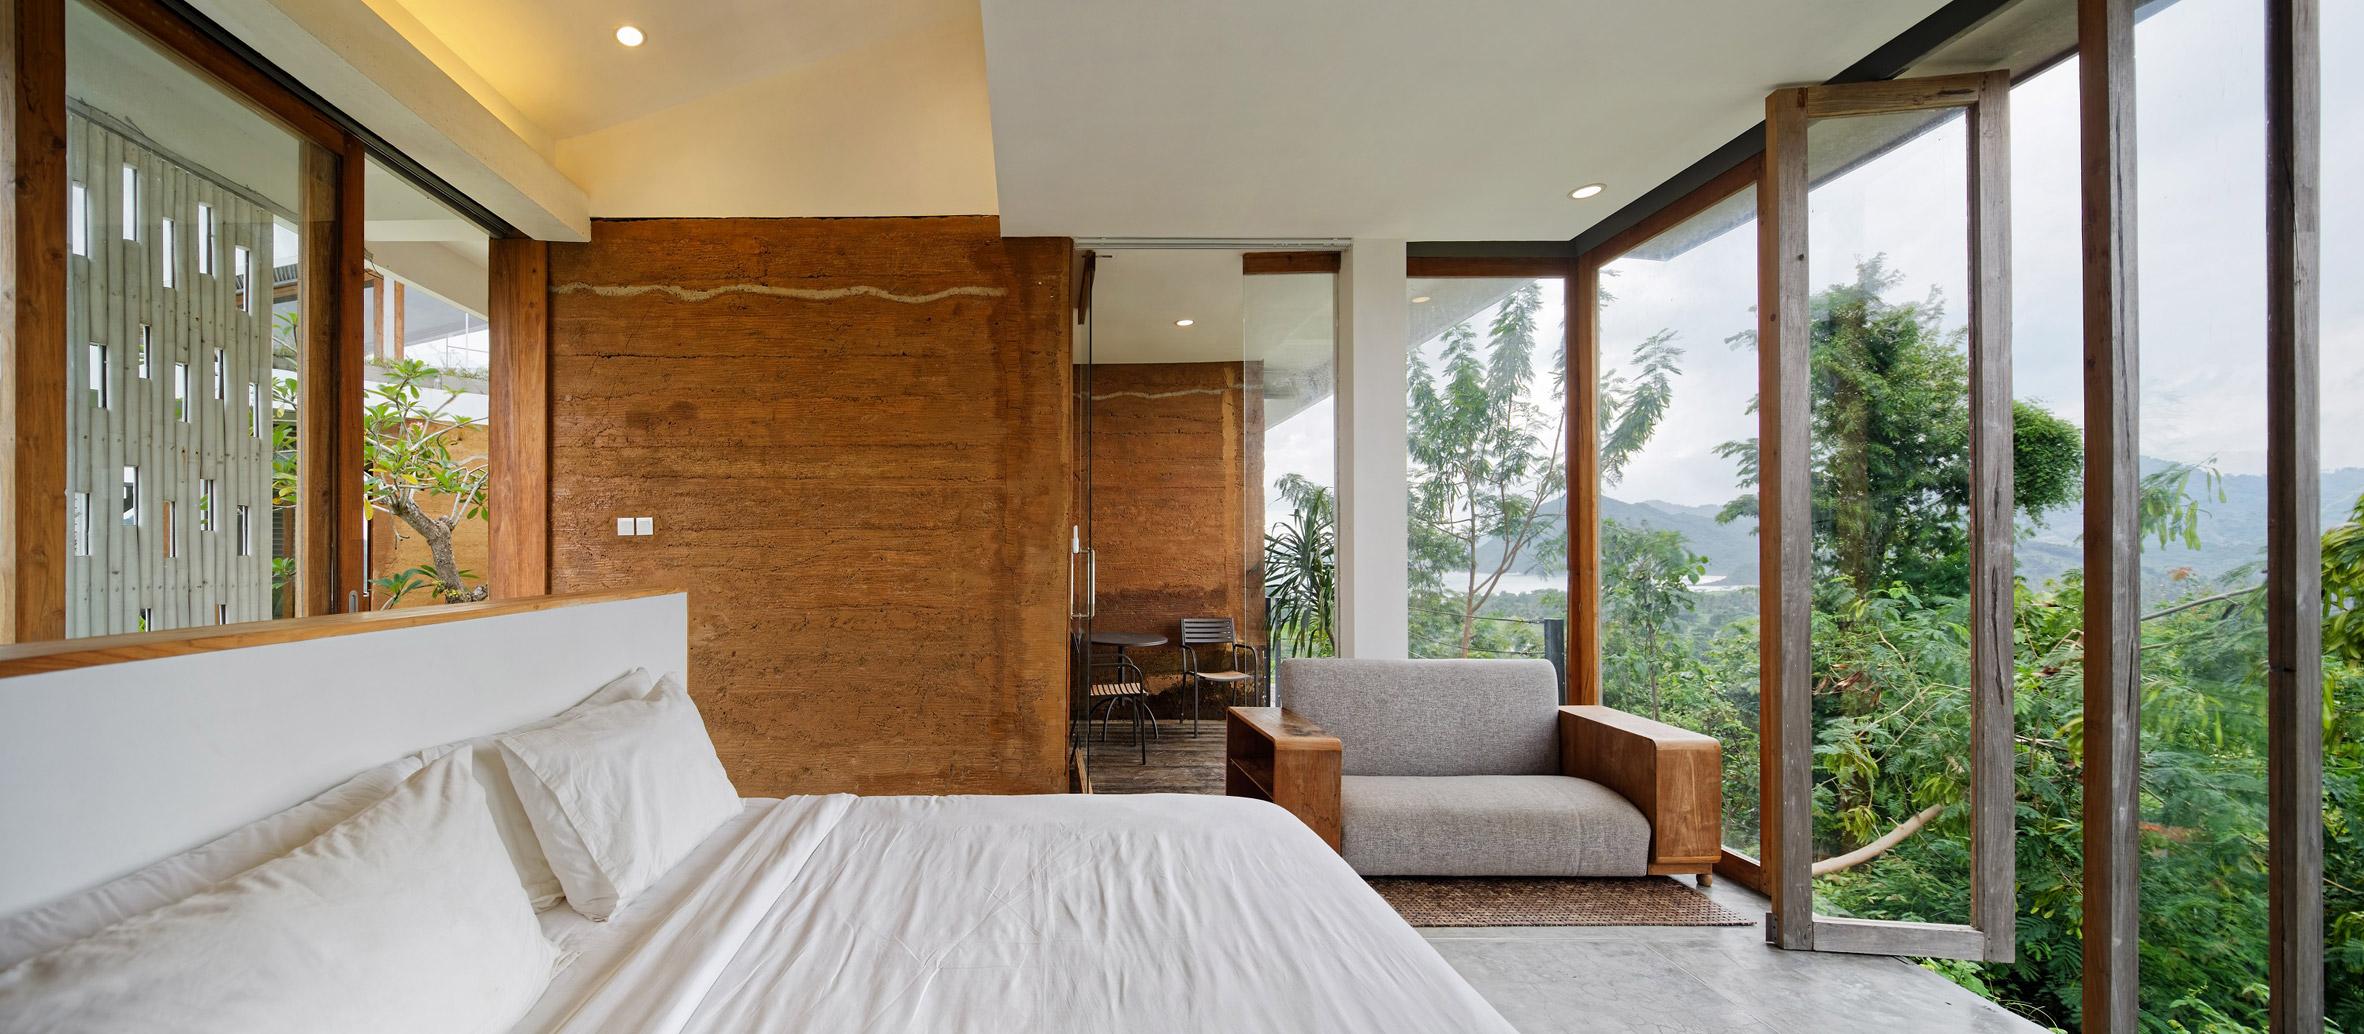 clay-house-budi-pradono-architects-architecture_dezeen_2364_col_18.jpg